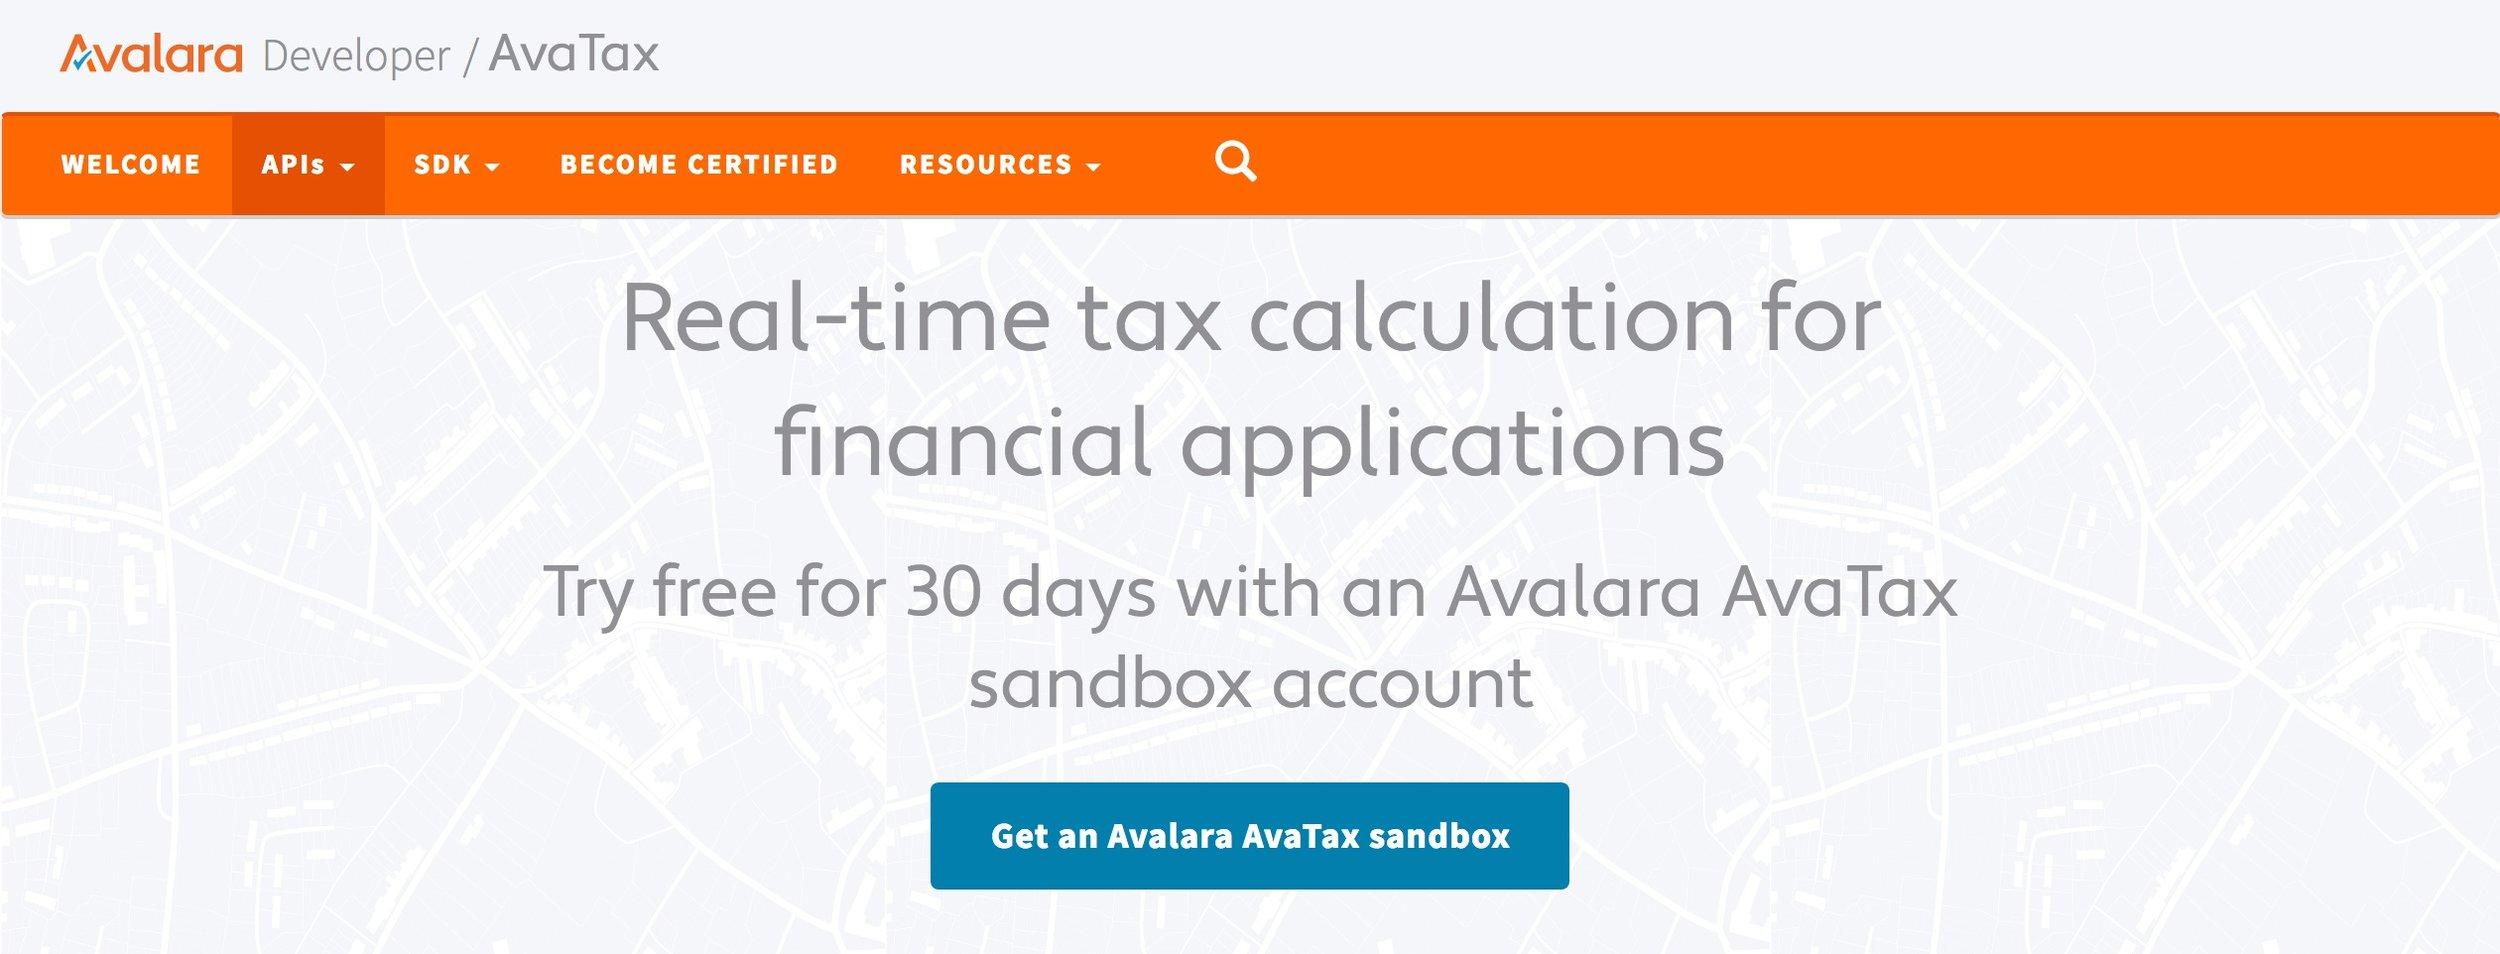 Avalara's AvaTax developer portal